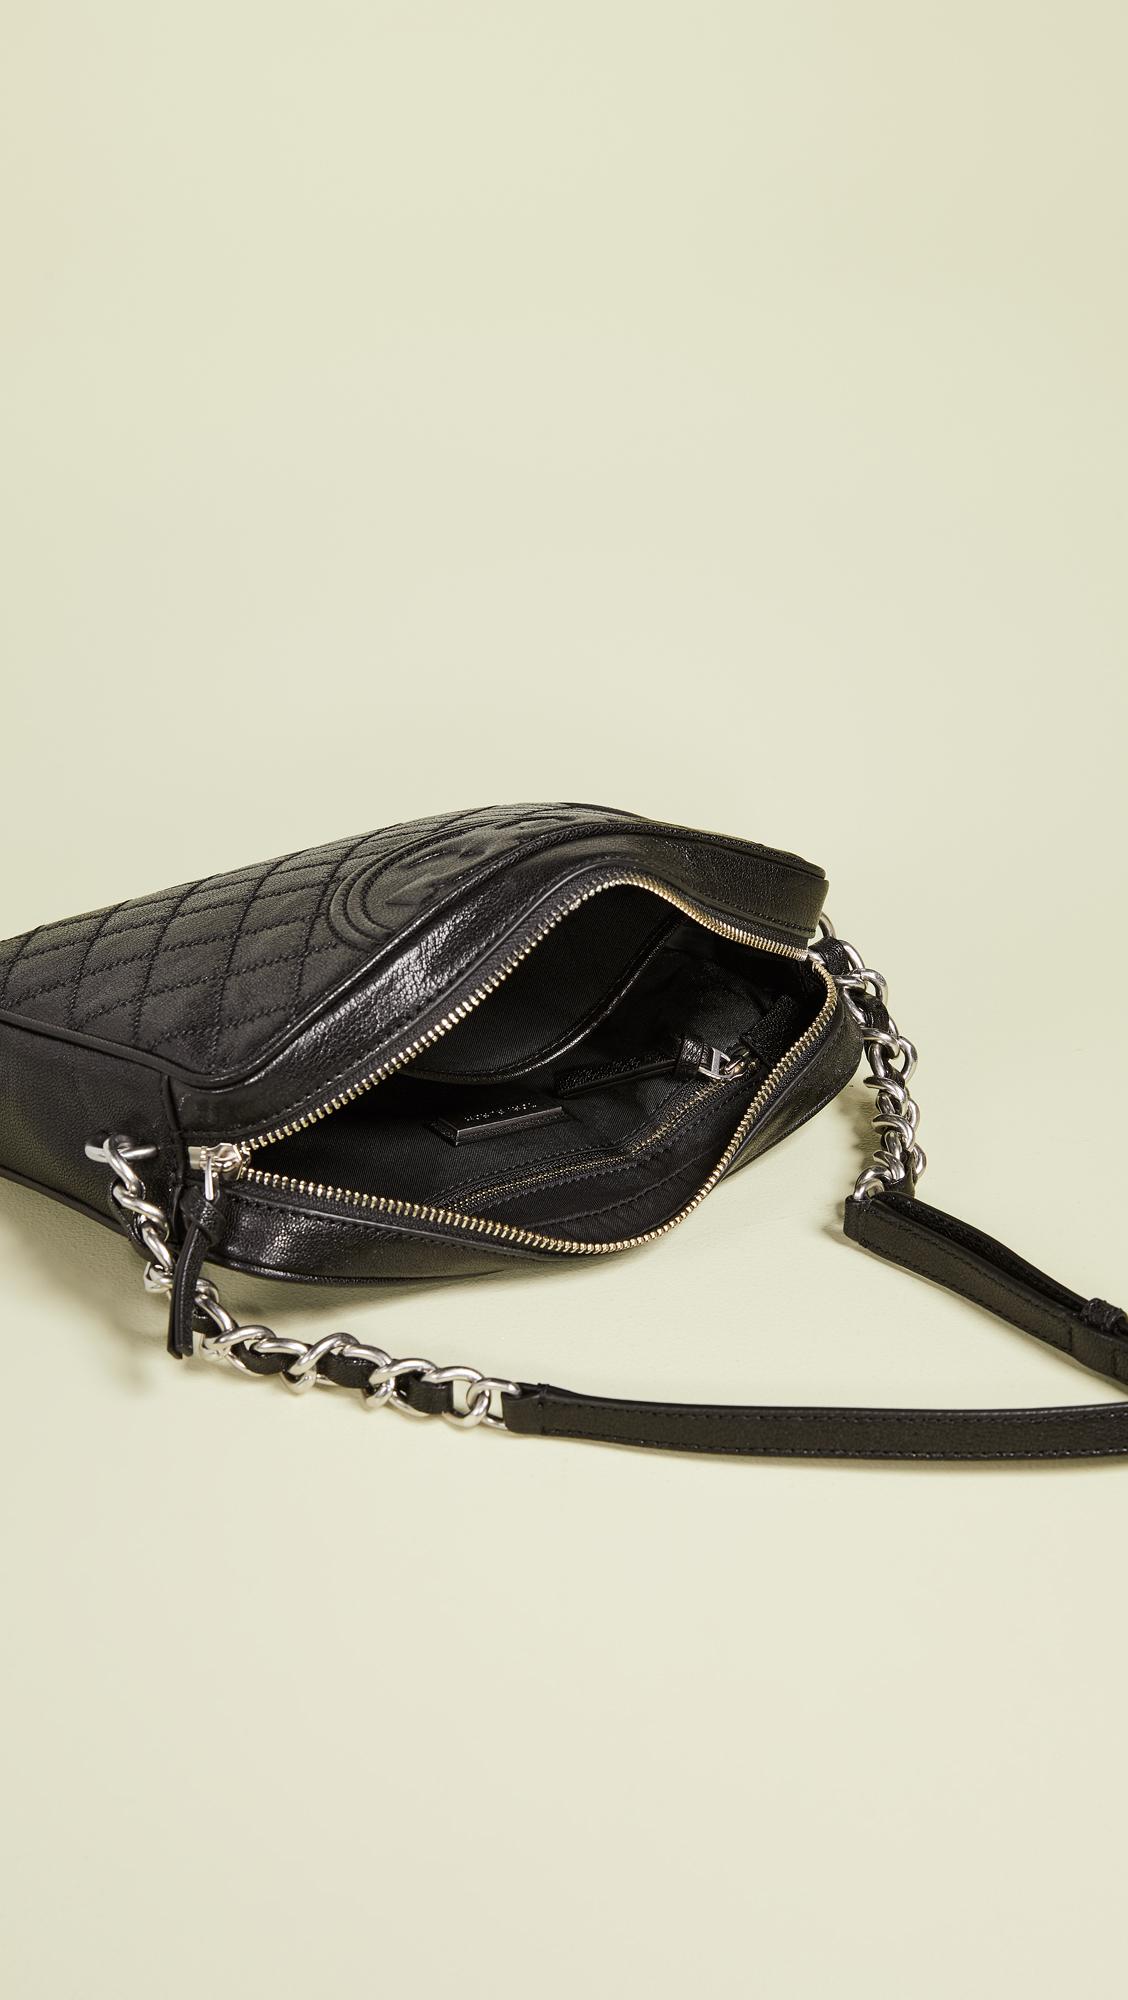 7db49b99610c Tory Burch Fleming Distressed Leather Camera Bag